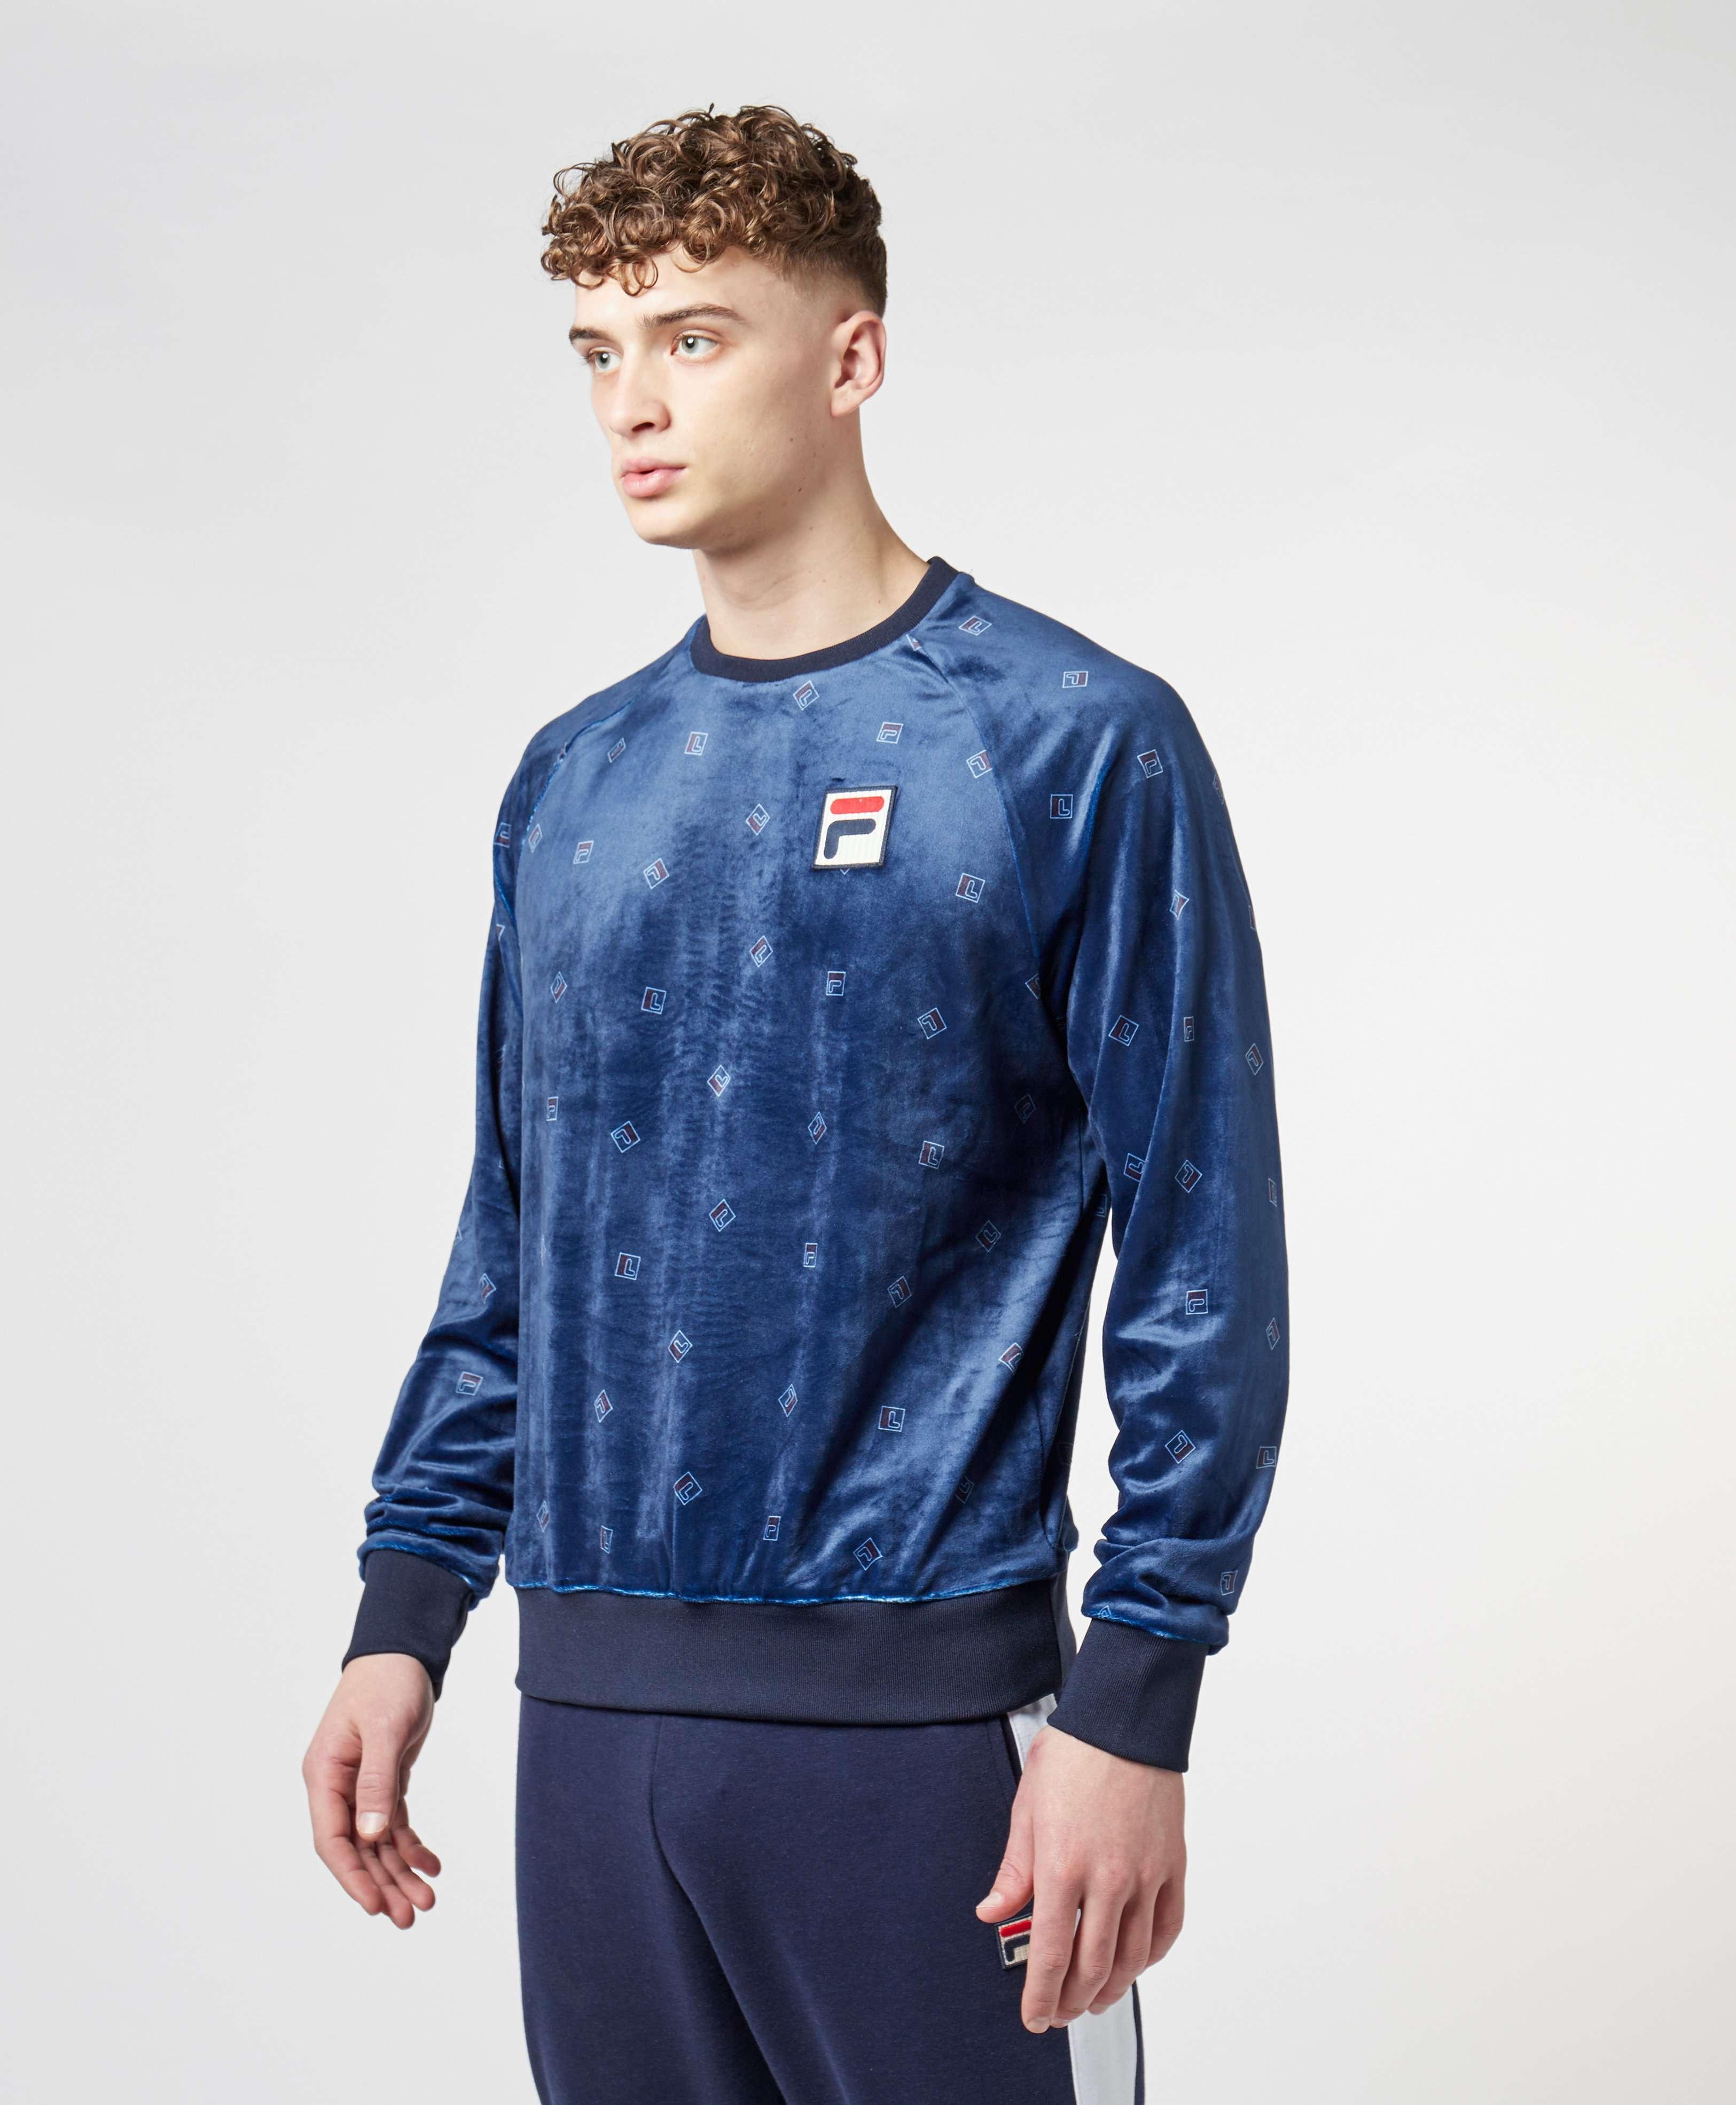 Fila All Over Print Sweatshirt